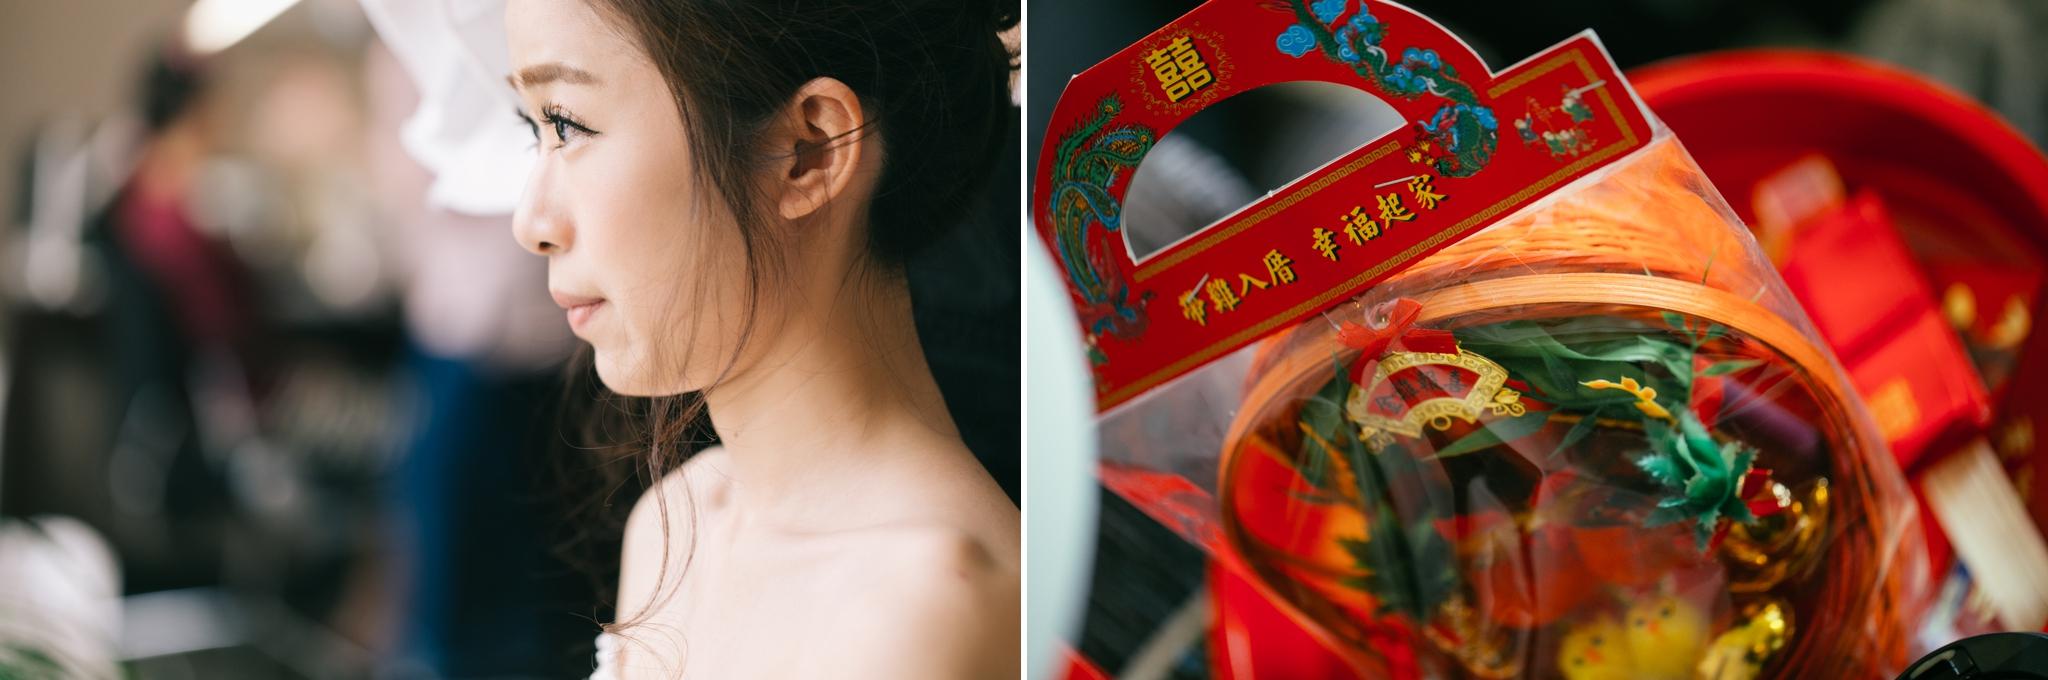 Tina+Nash-wedding-台北婚禮迎娶晚宴-新莊終身大事-006.jpg